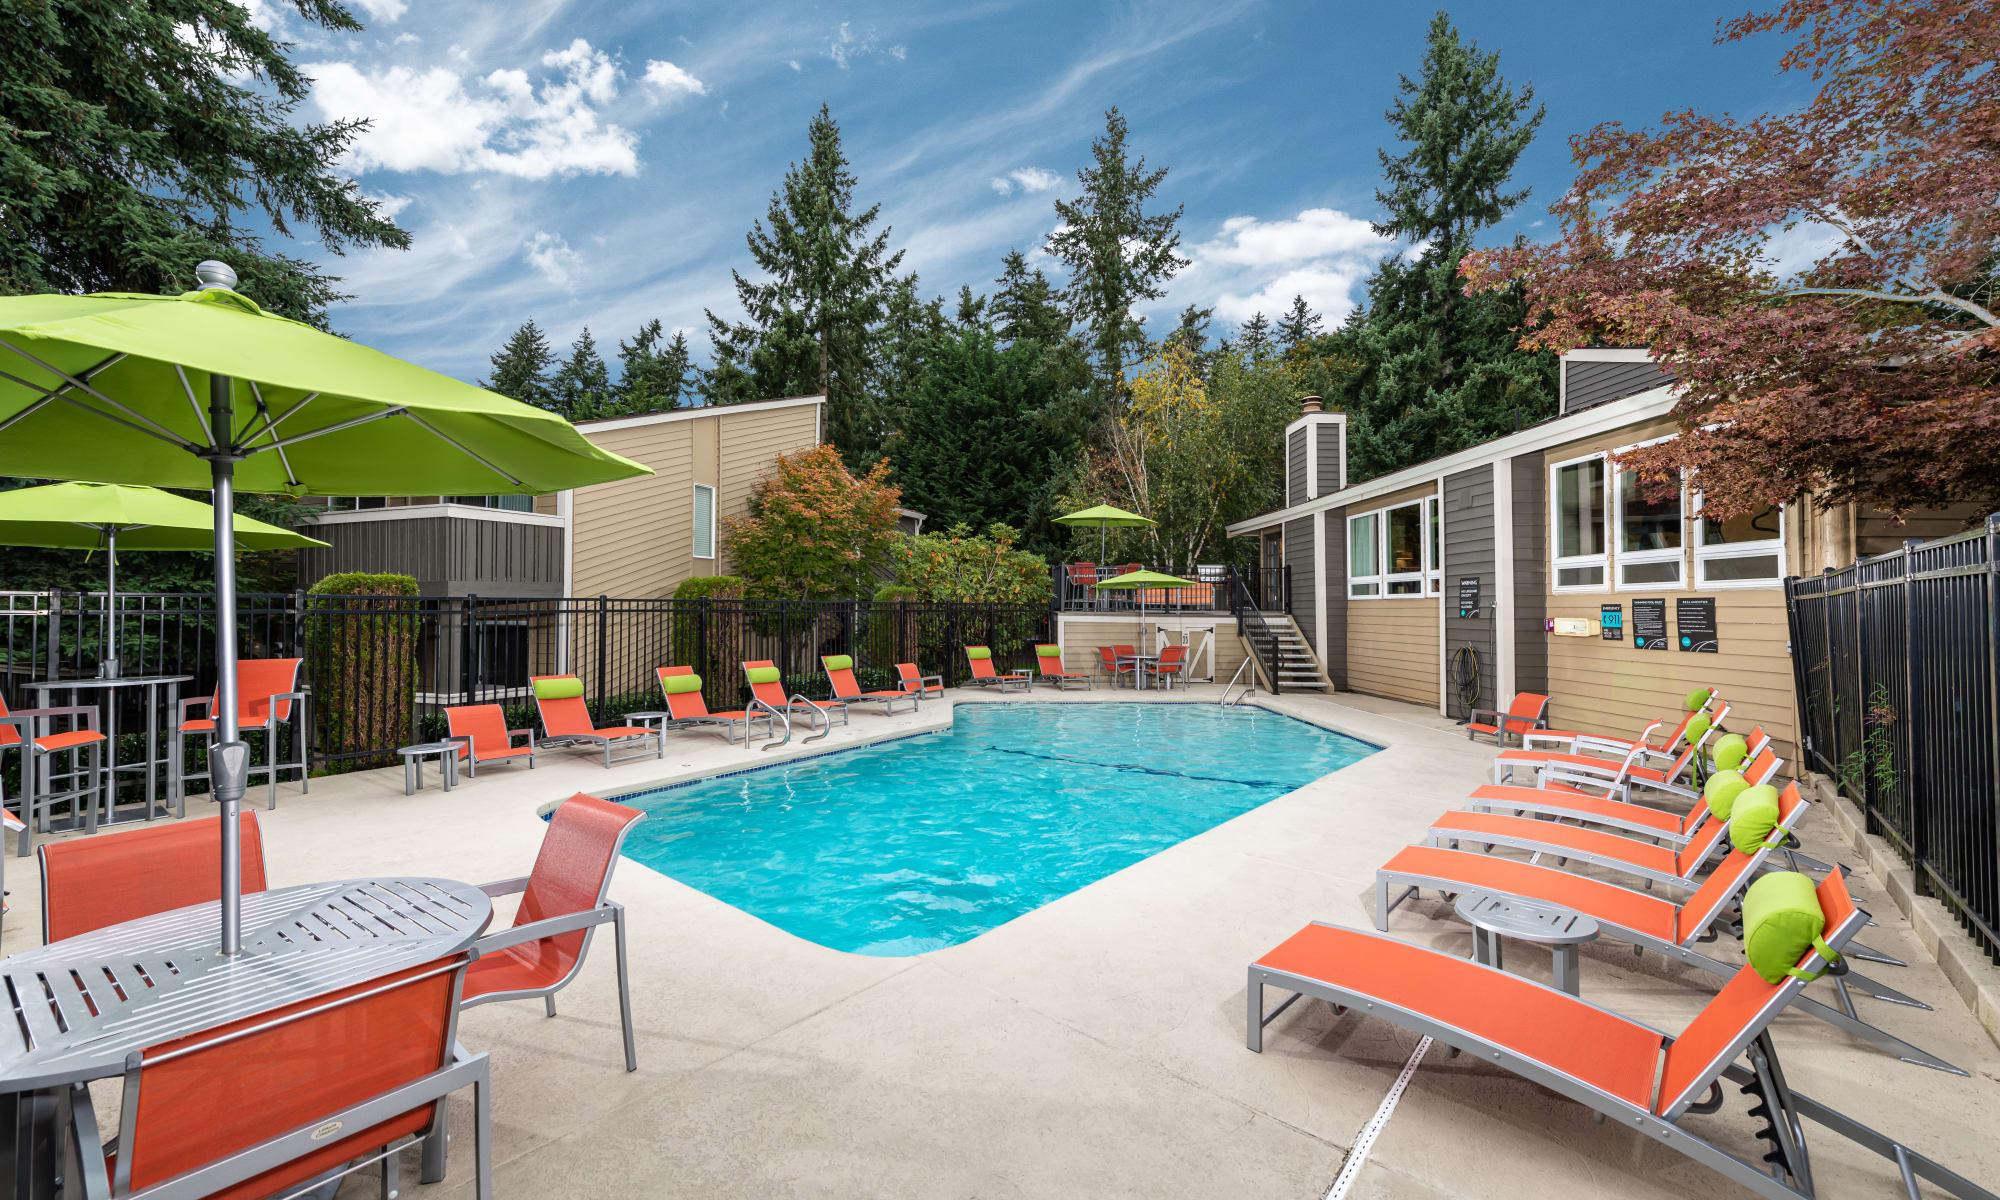 Vue Kirkland Apartments amenities in Kirkland, Washington